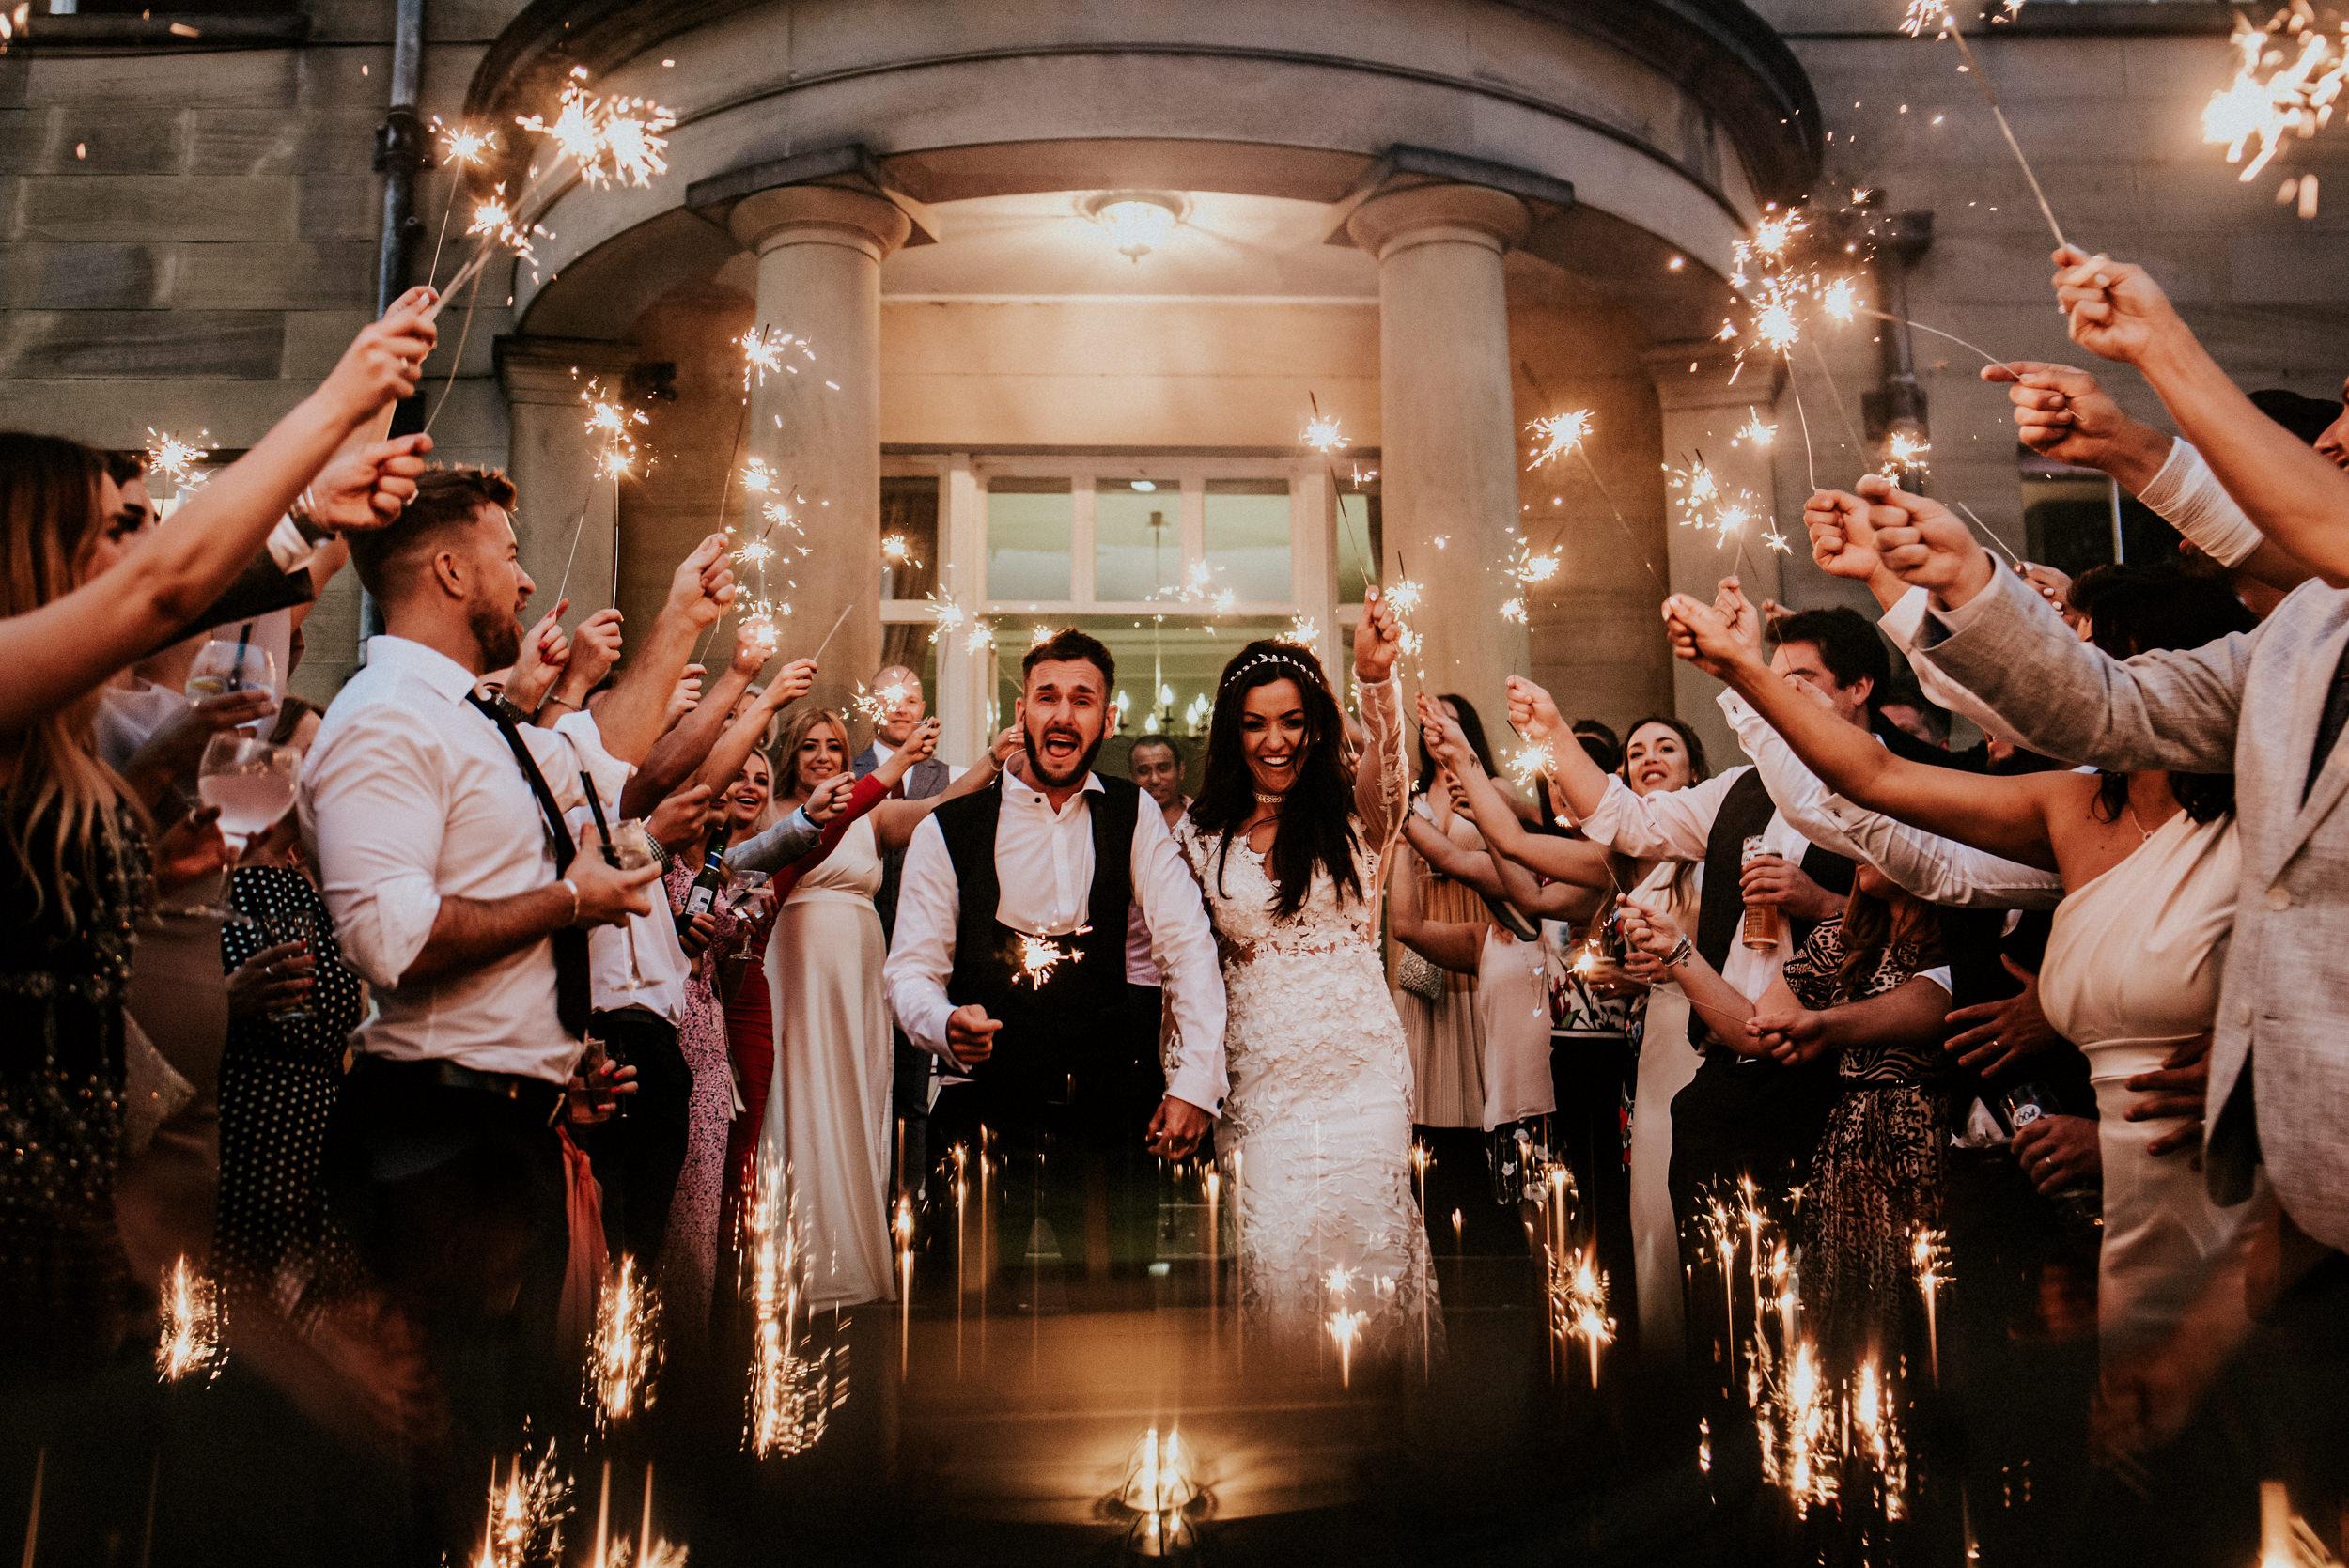 saltmarshe-hall-wedding-photos-shutter-go-click-yorkshire-creative-wedding-photographer-shutter-go-click-97.jpg